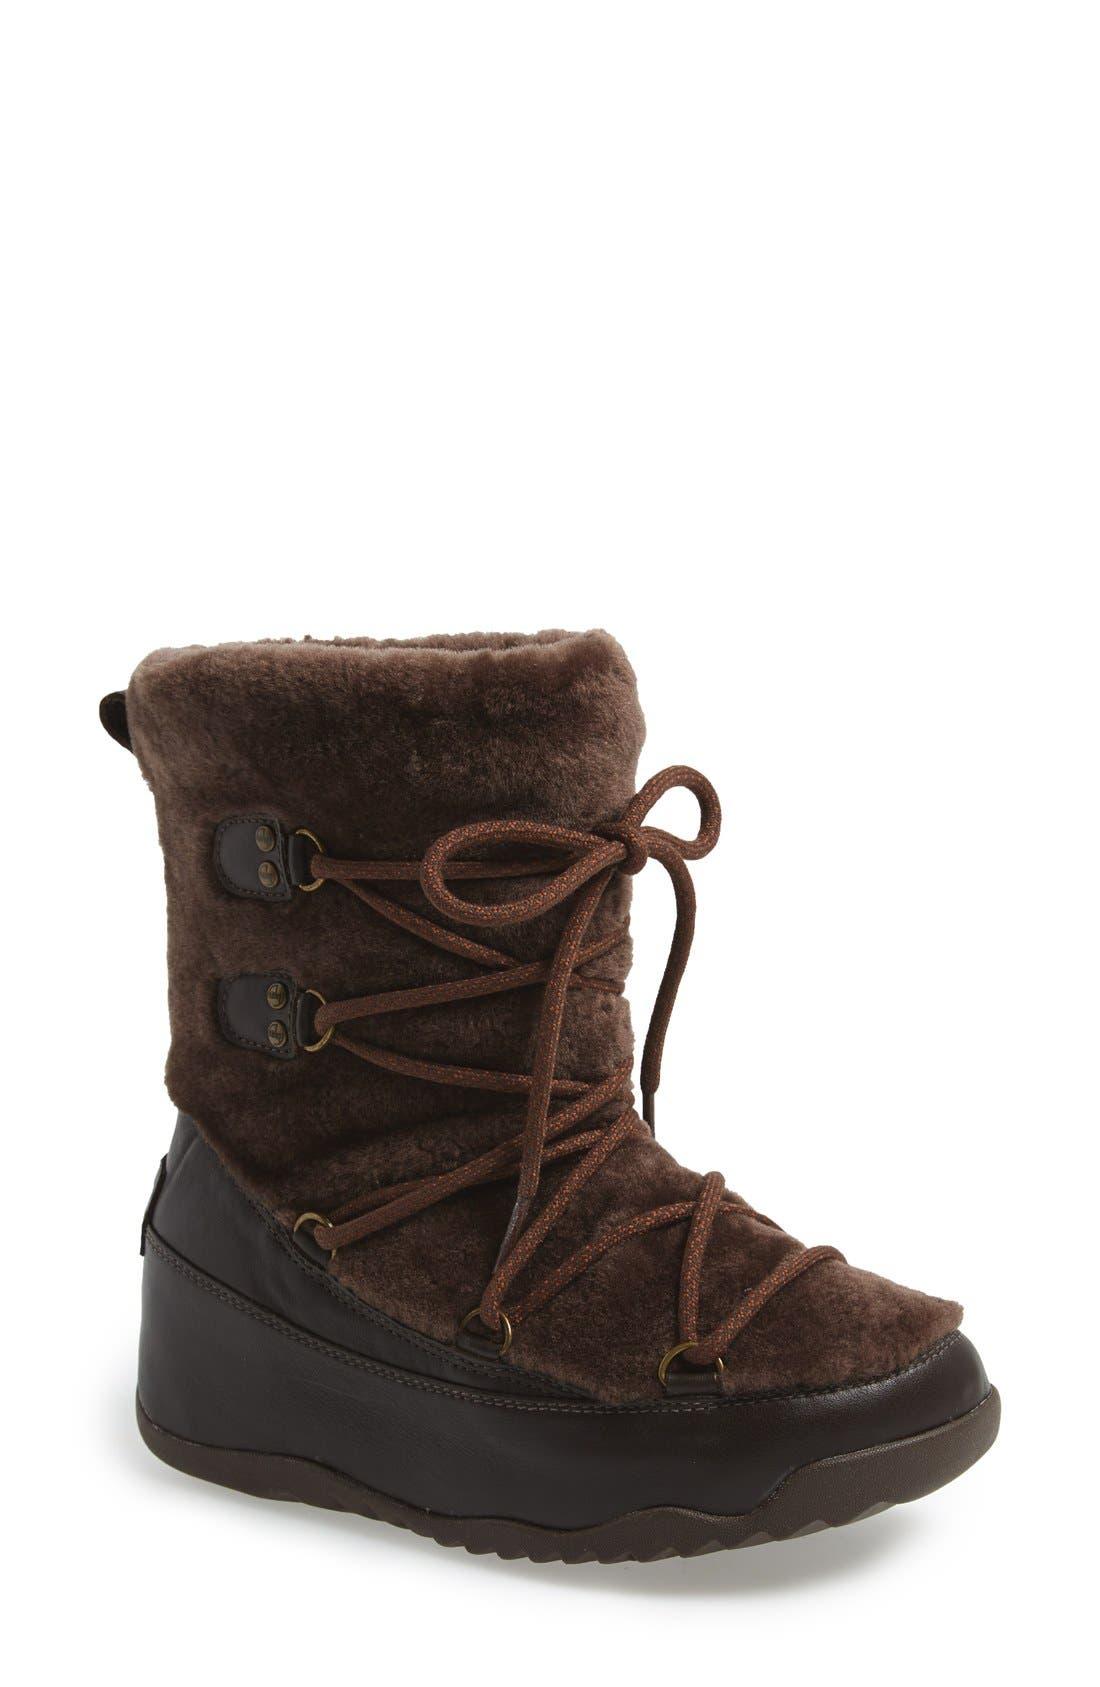 'Superblizz' Boot, Main, color, 200